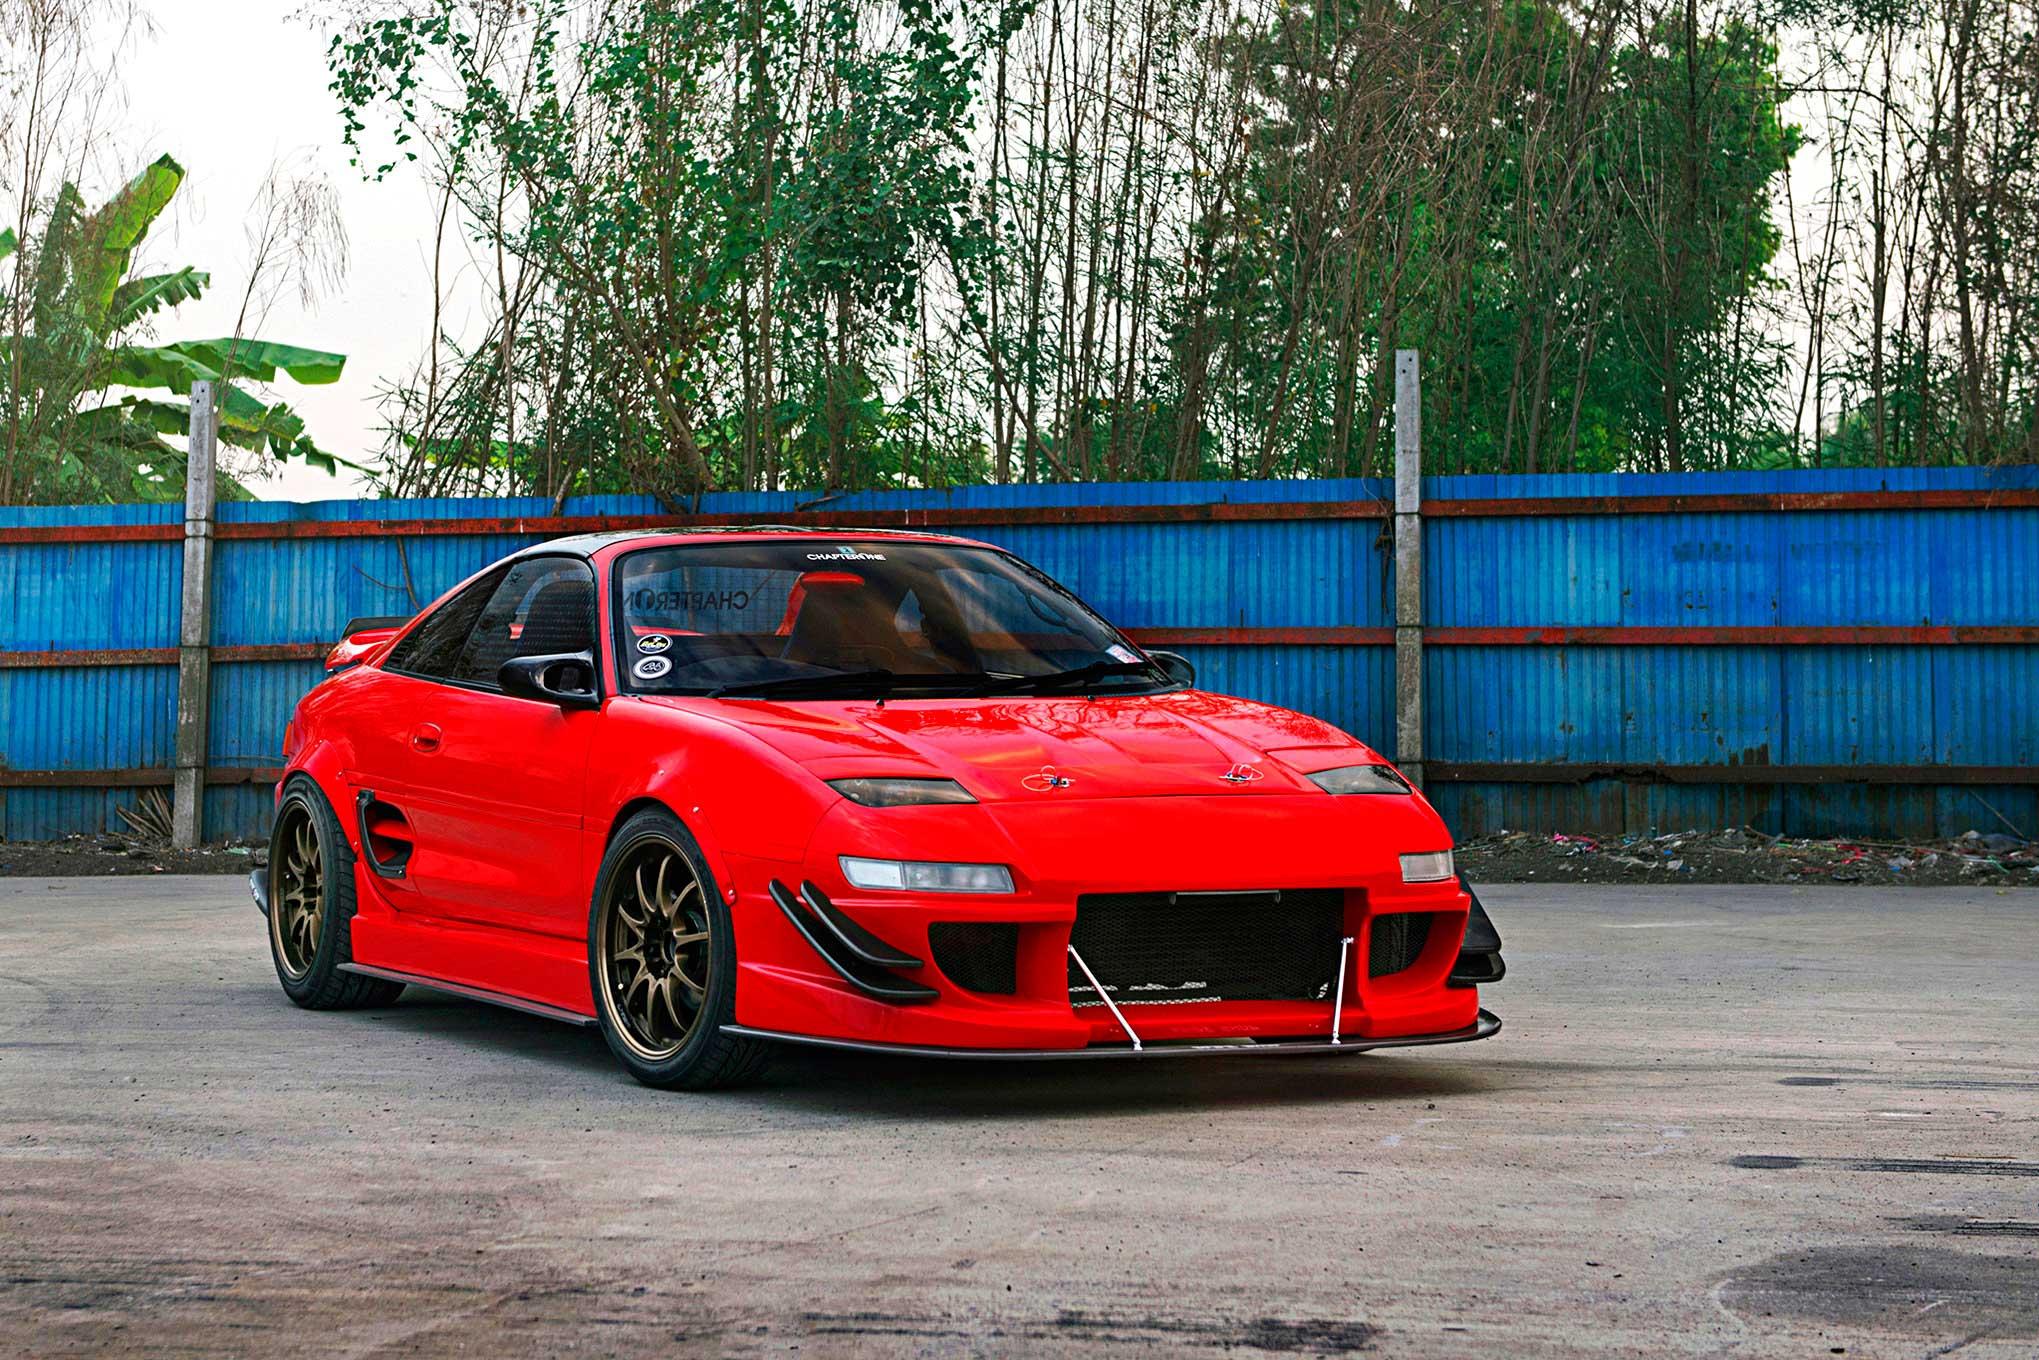 Kelebihan Mazda Mr2 Spesifikasi